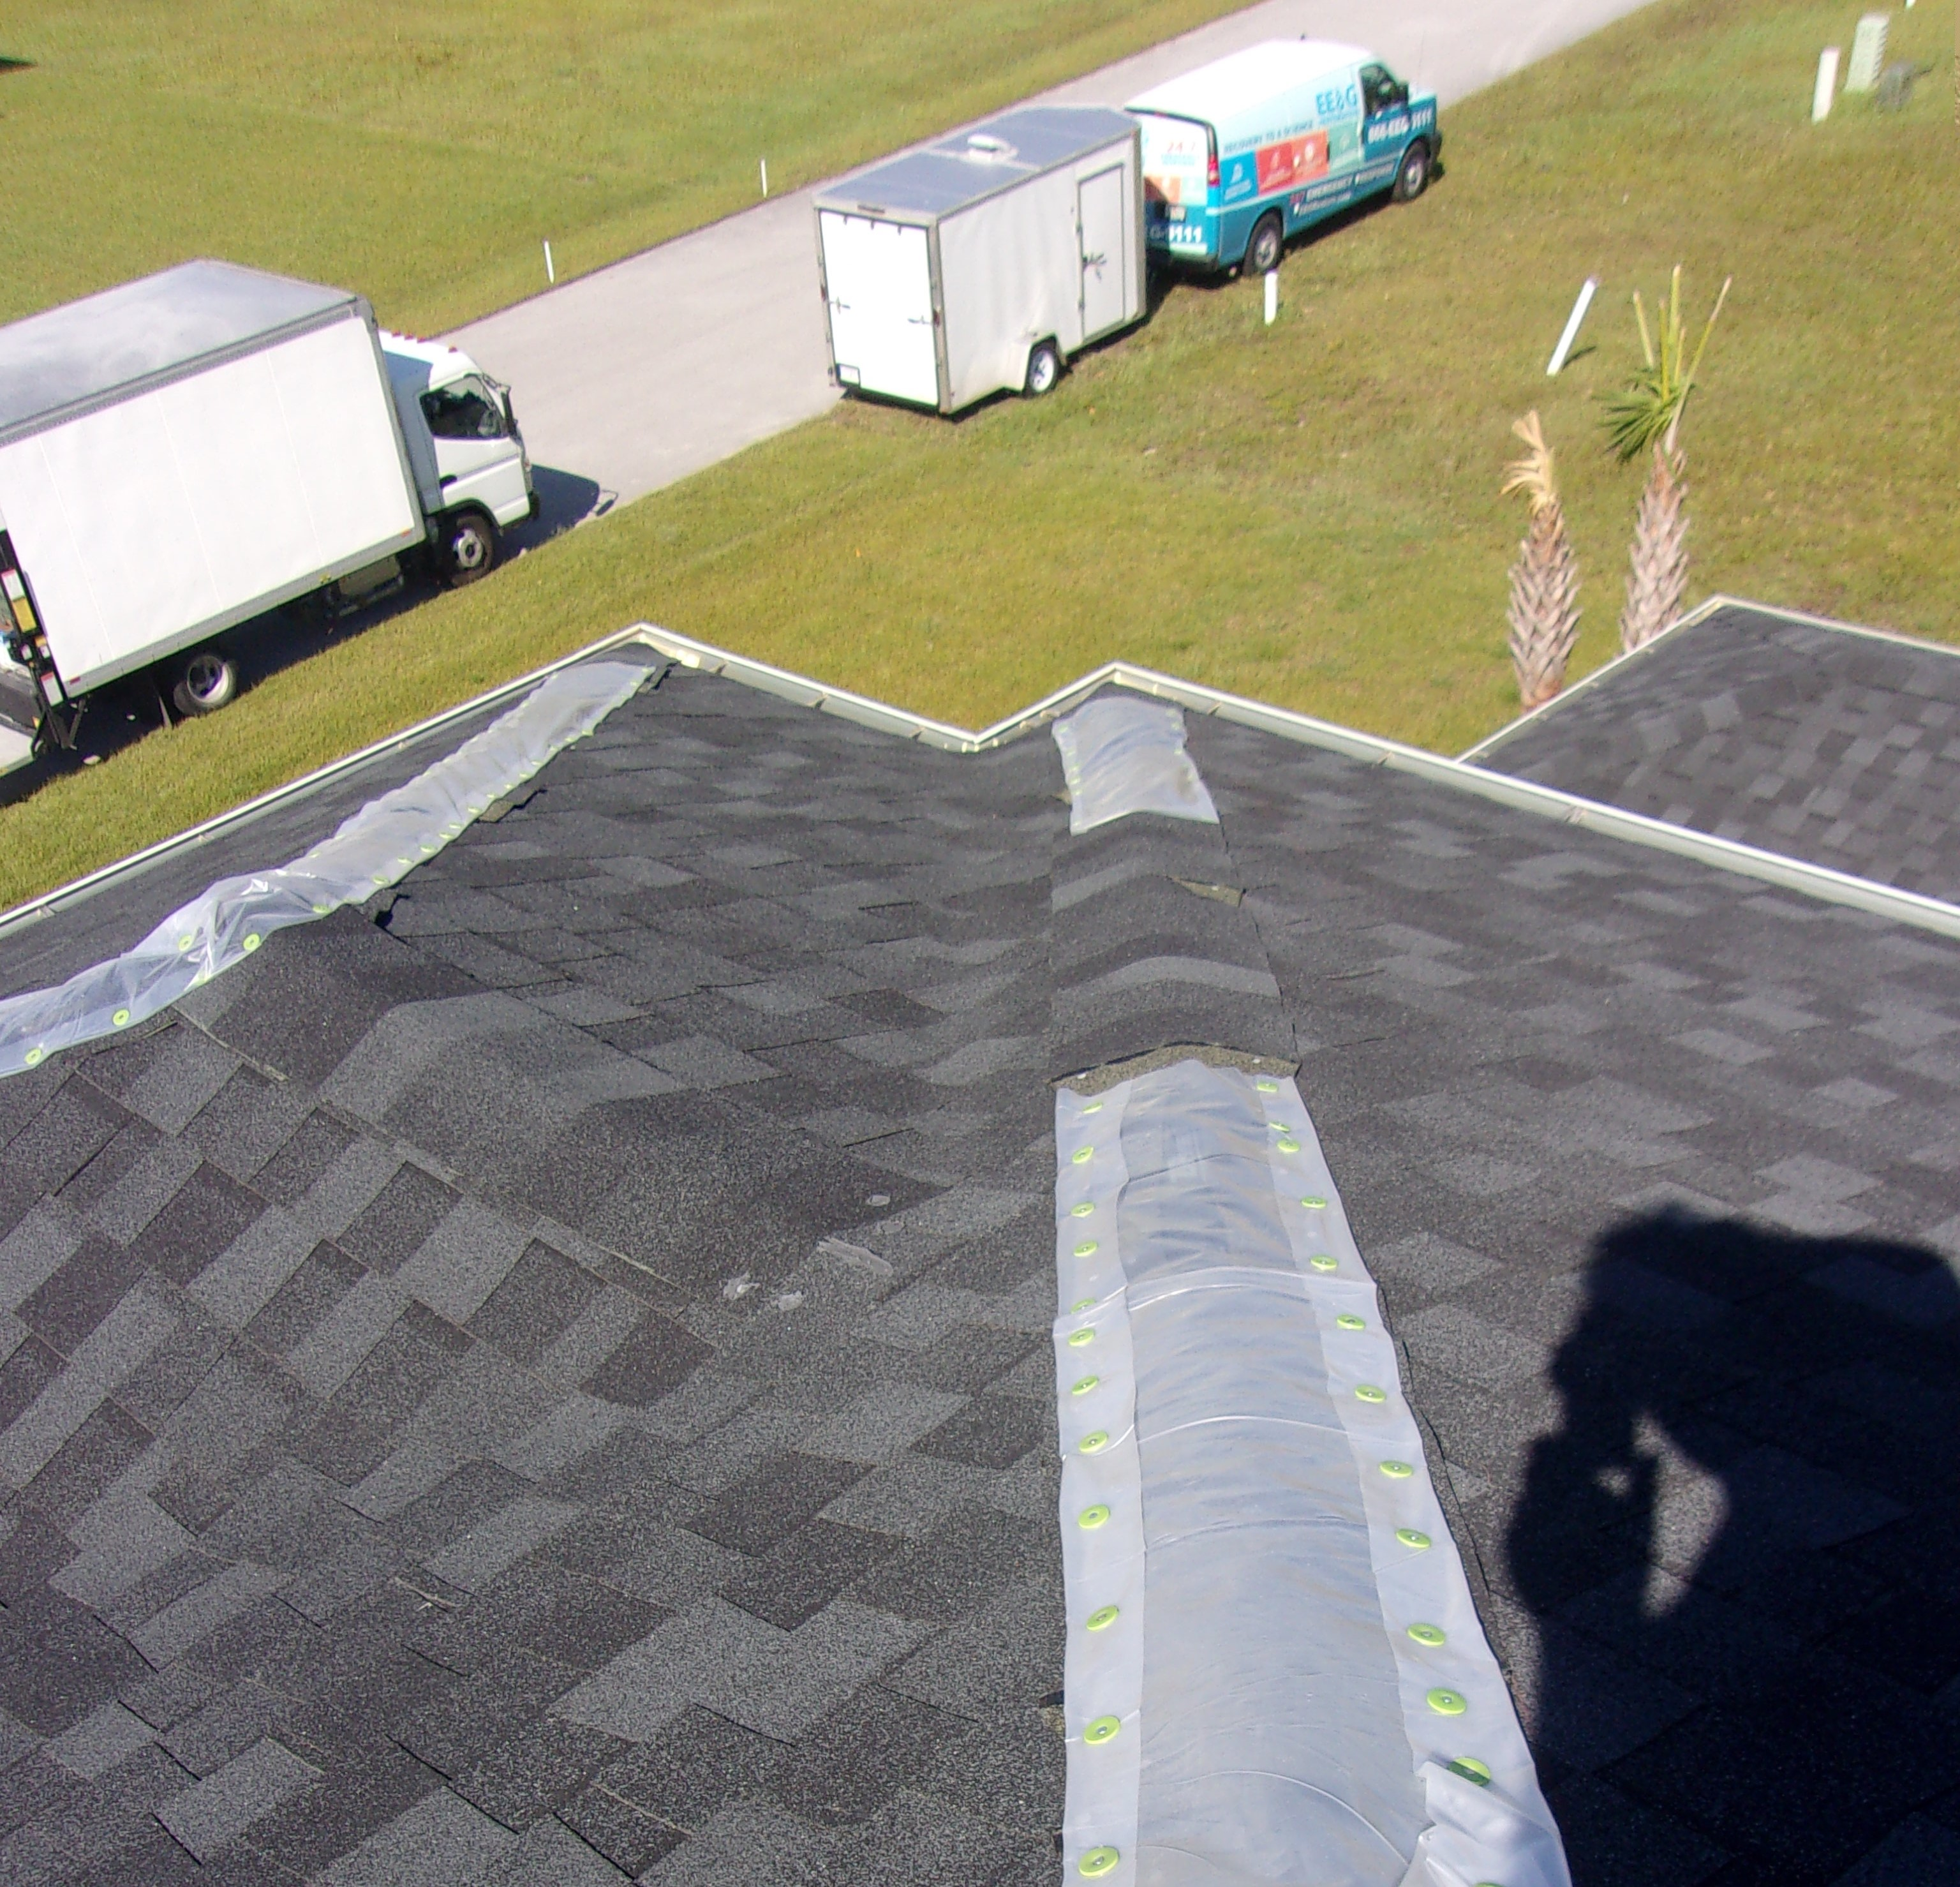 EE&G Restoration Atlanta, Water Damage Restoration, Fire Damage, Mold Remediation and Removal image 19